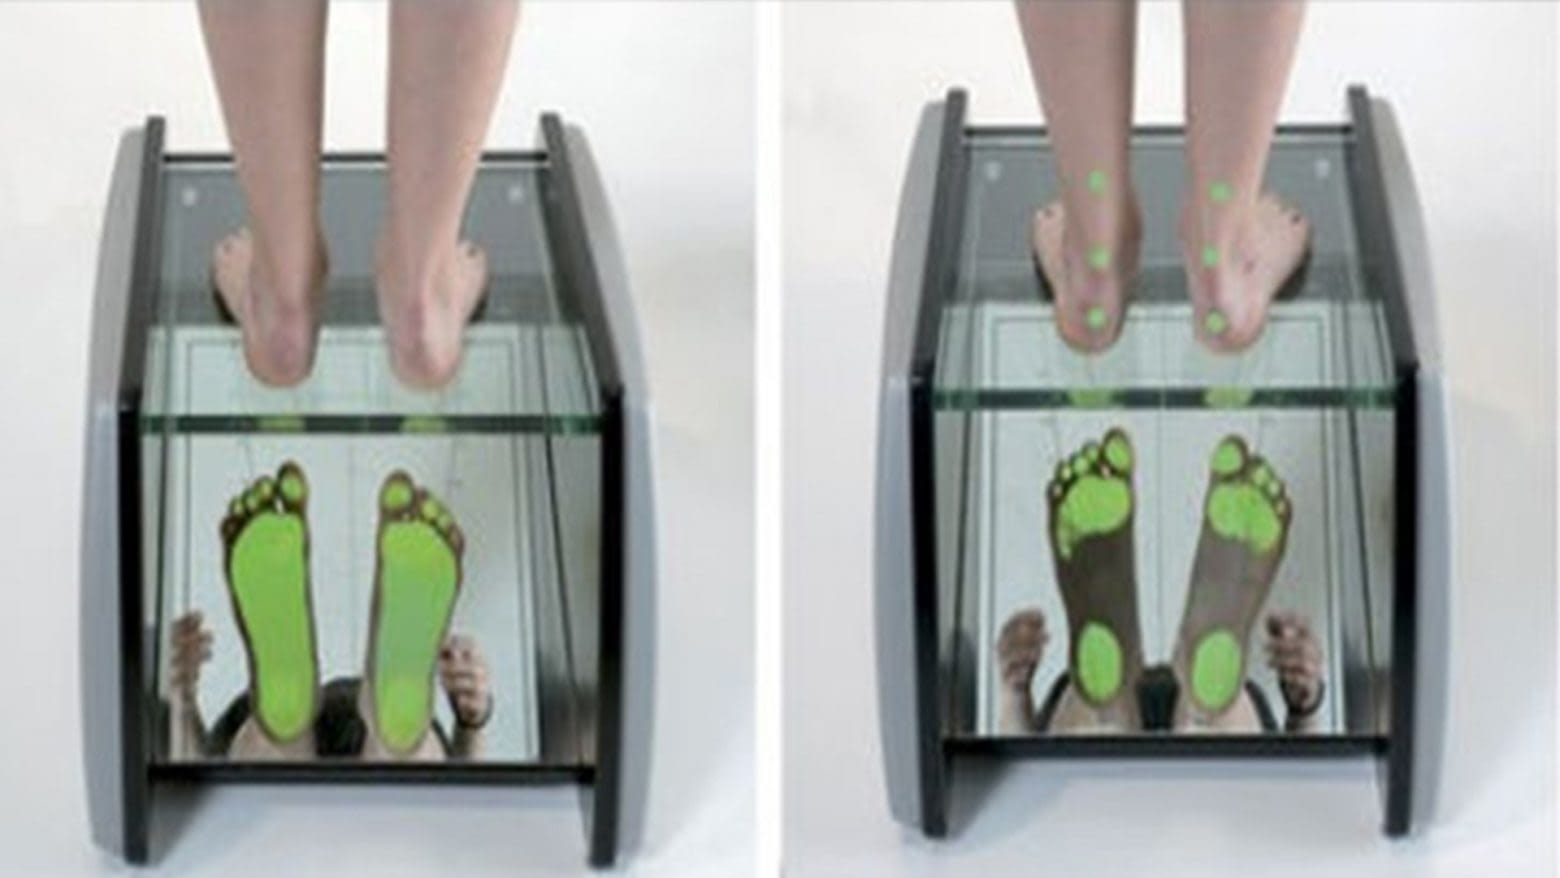 dijagnostika stopala podometar 1